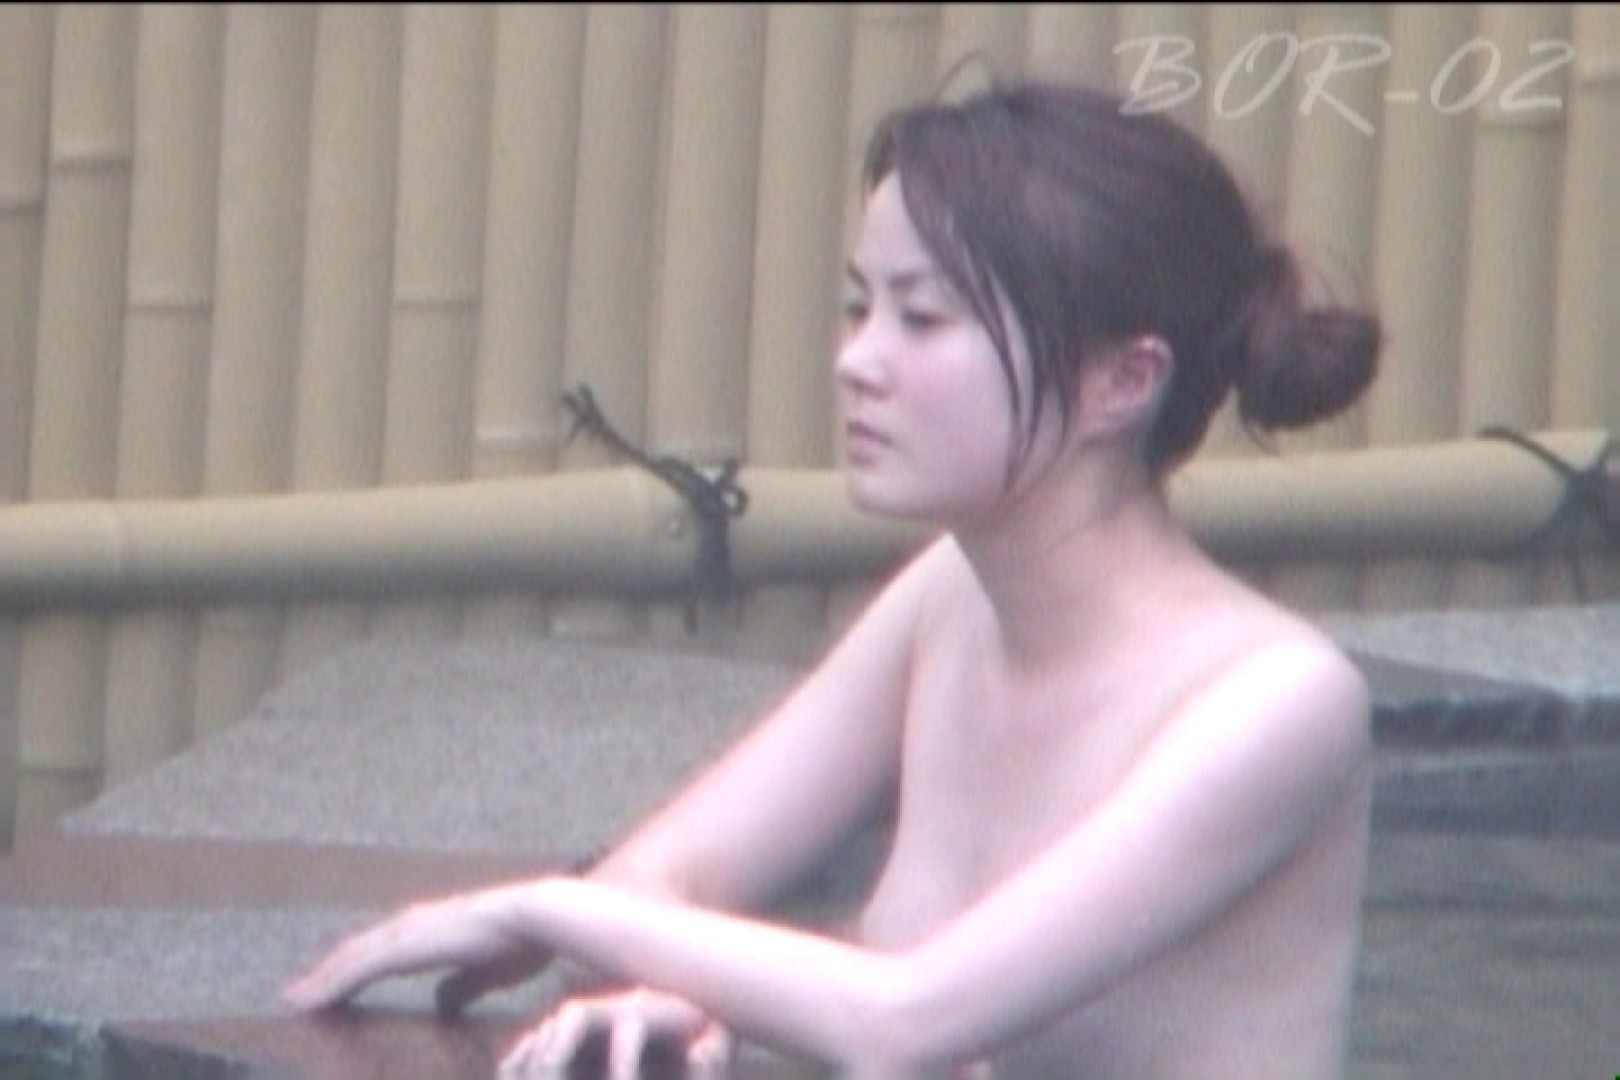 Aquaな露天風呂Vol.474 美しいOLの裸体 | 露天風呂突入  84pic 40